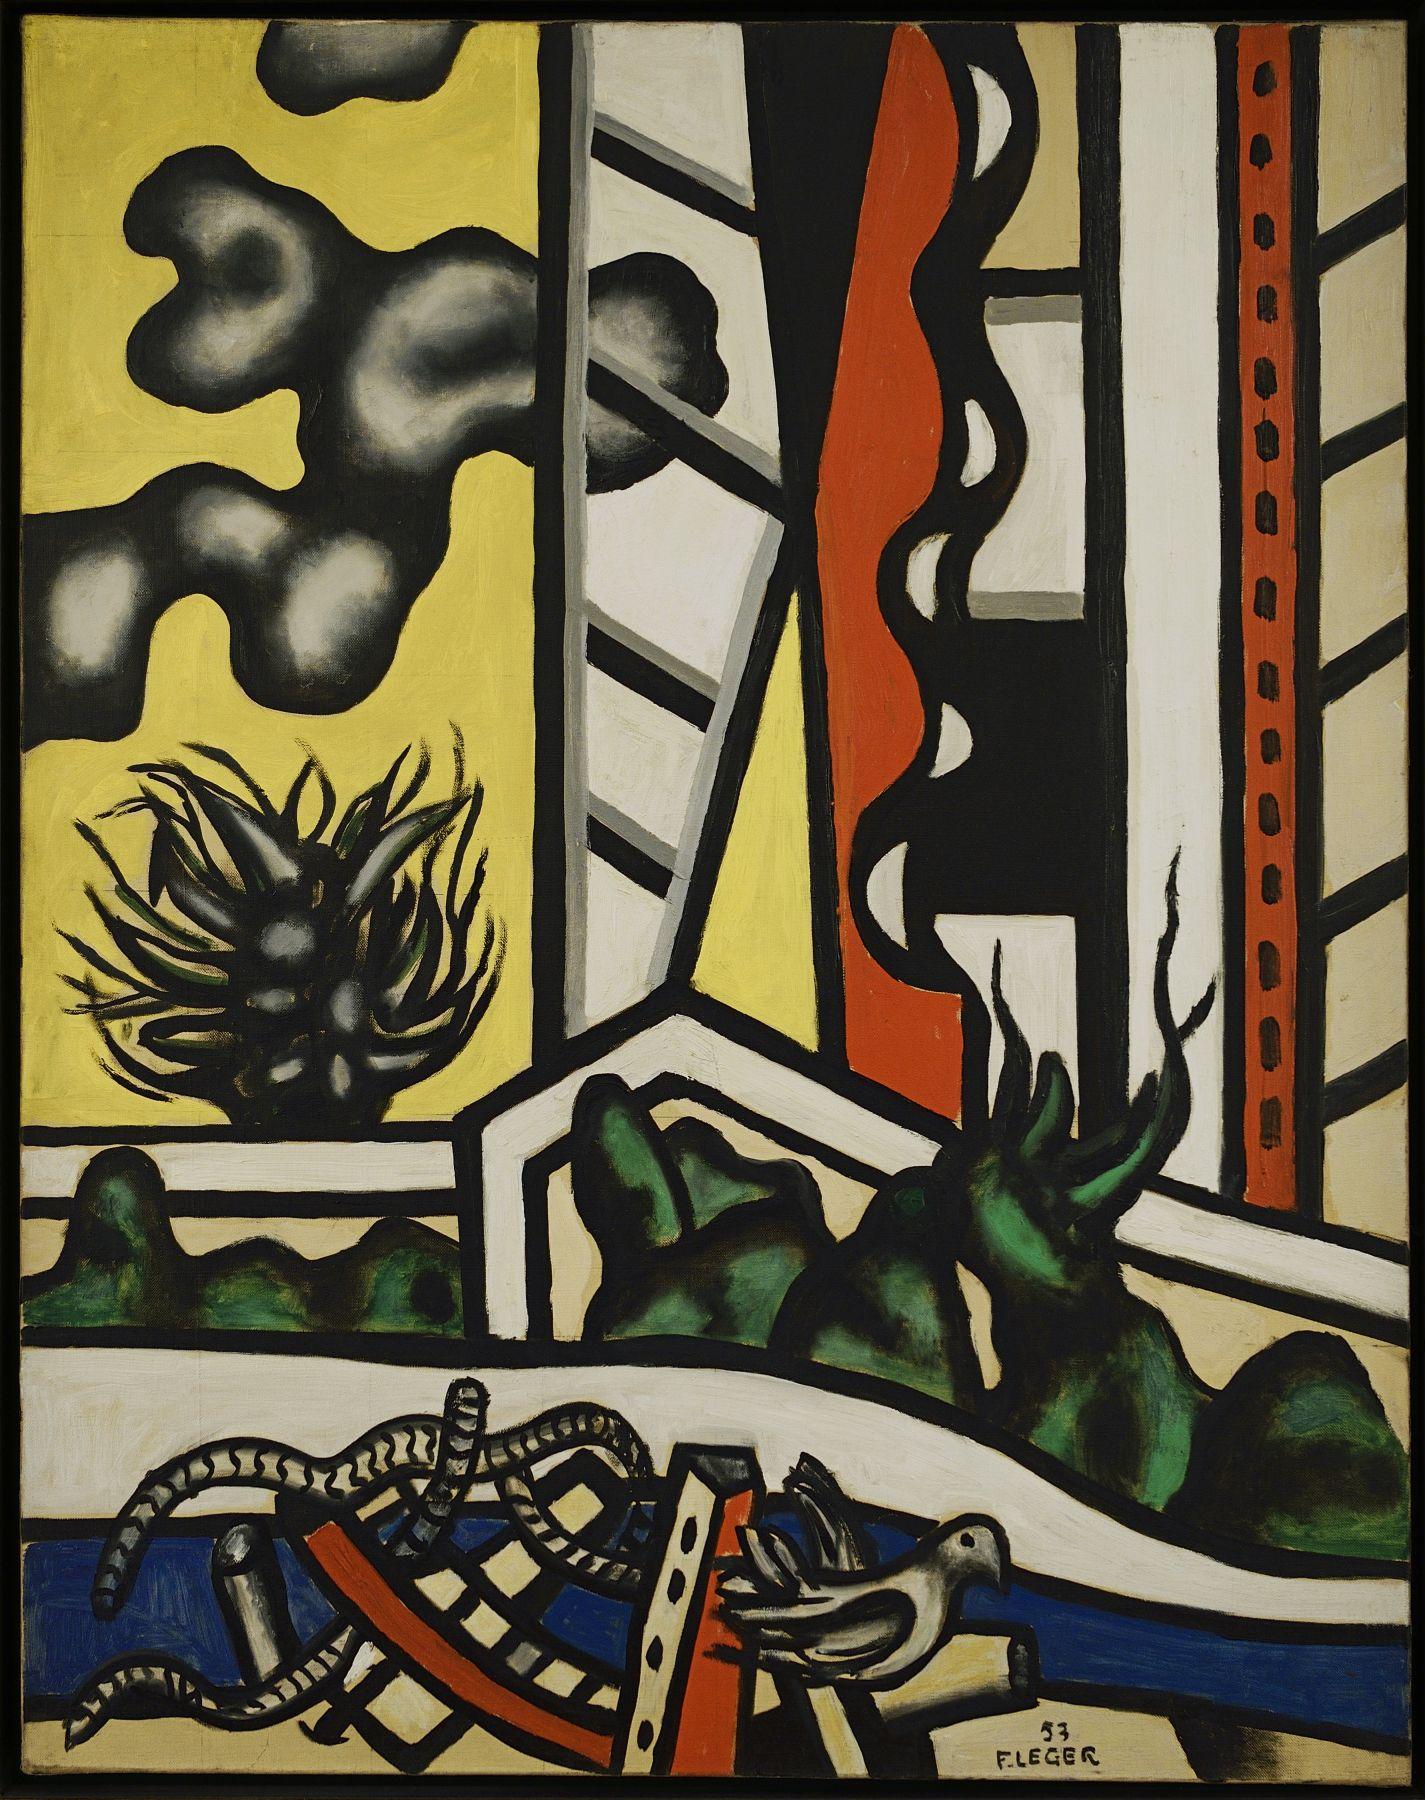 FERNAND LÉGER (French, 1881-1955), Elements mechaniquesdansle paysage,1953